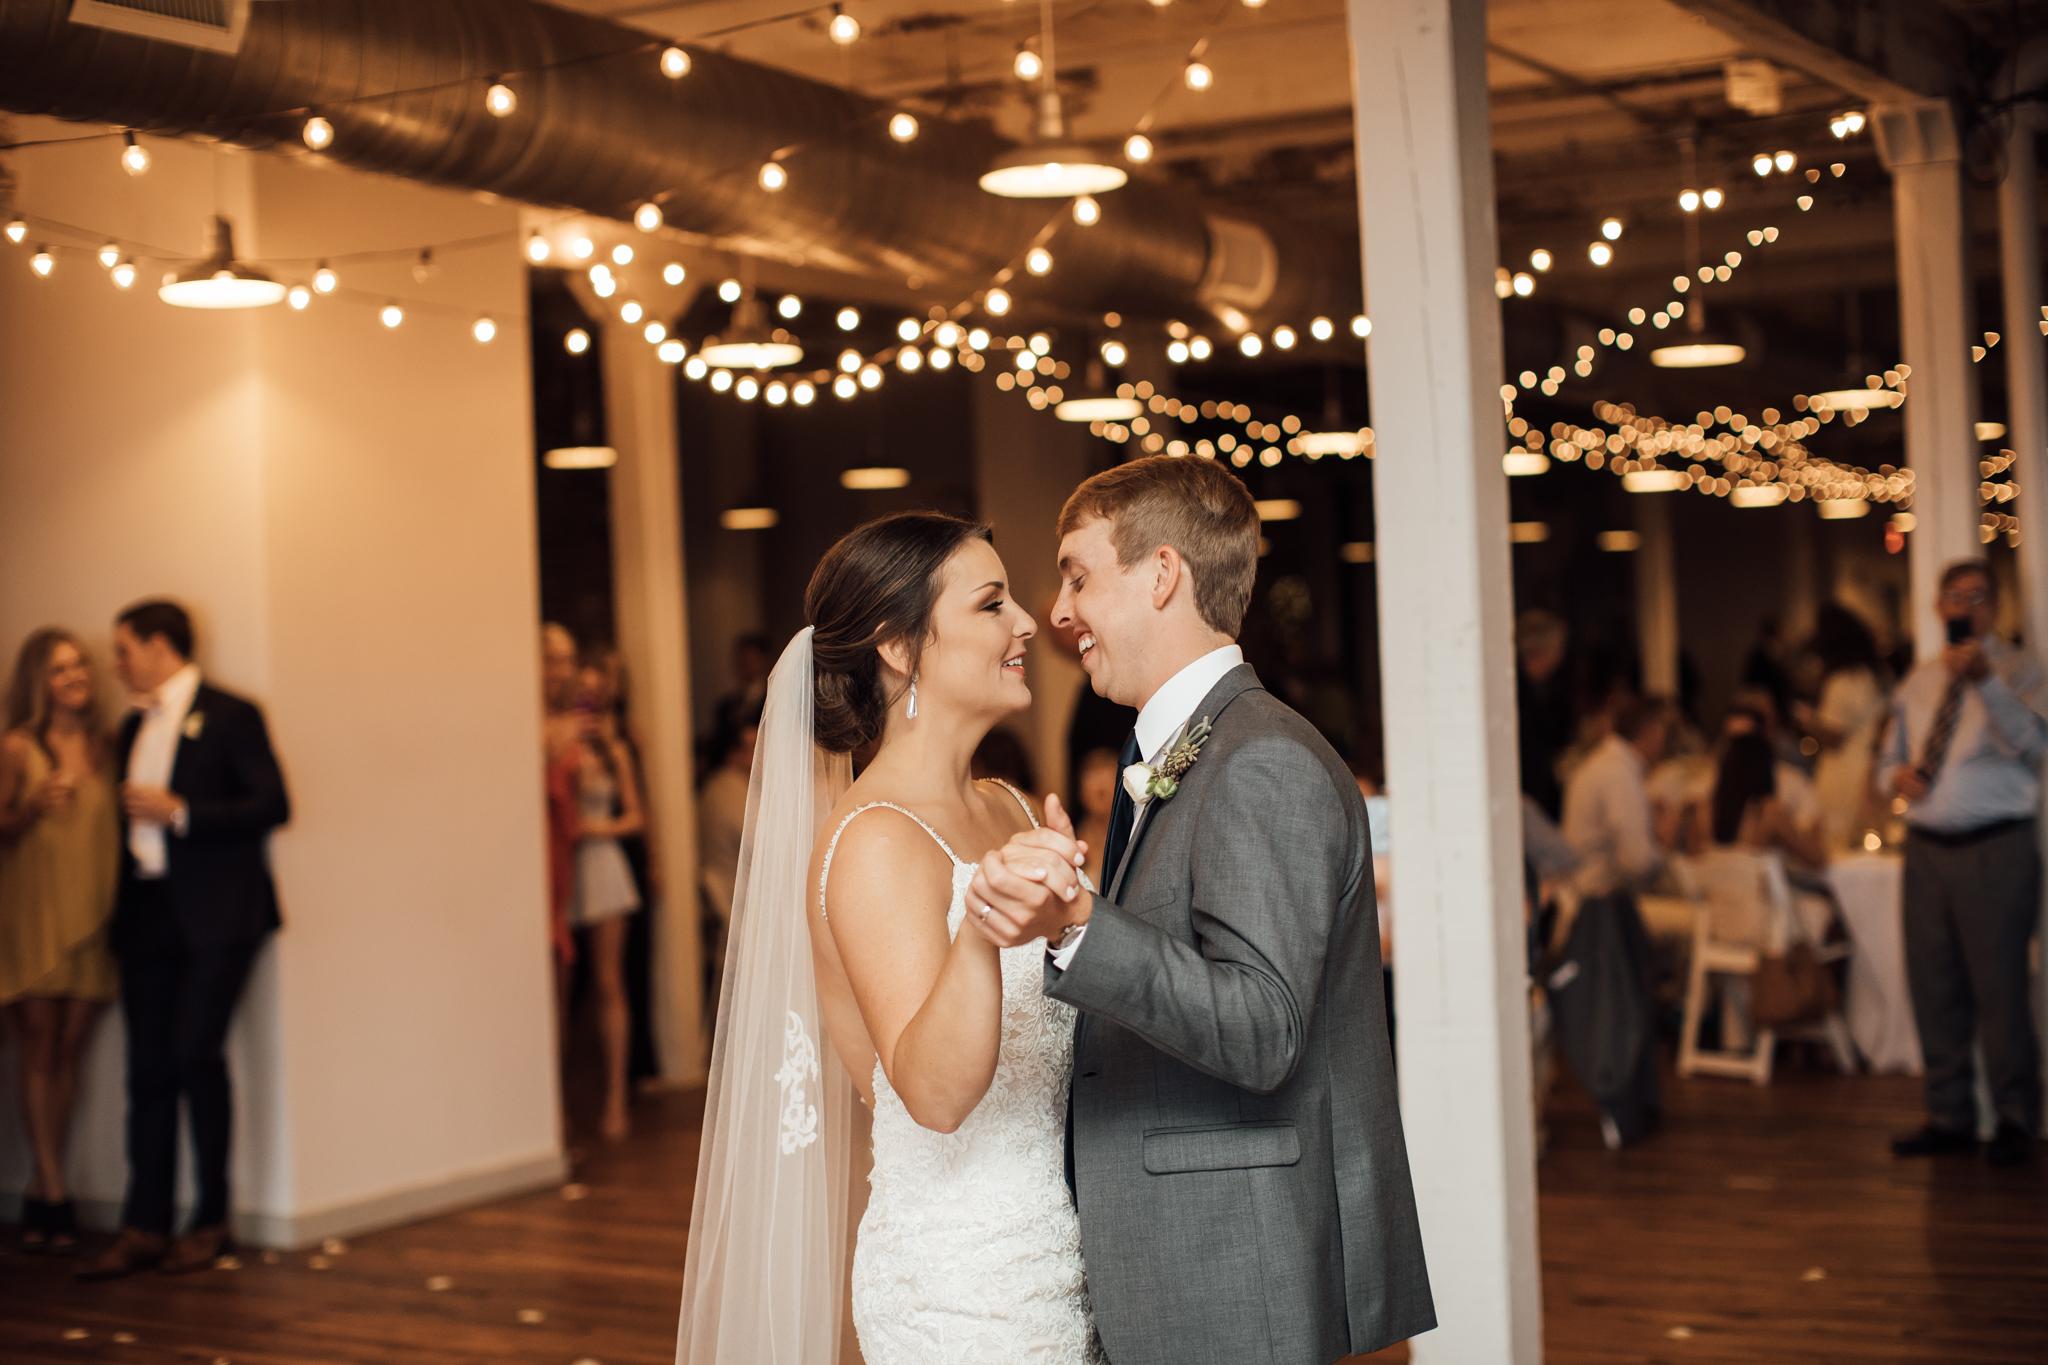 409smain-downtown-memphis-wedding-venue-thewarmtharoundyou (127 of 243).jpg